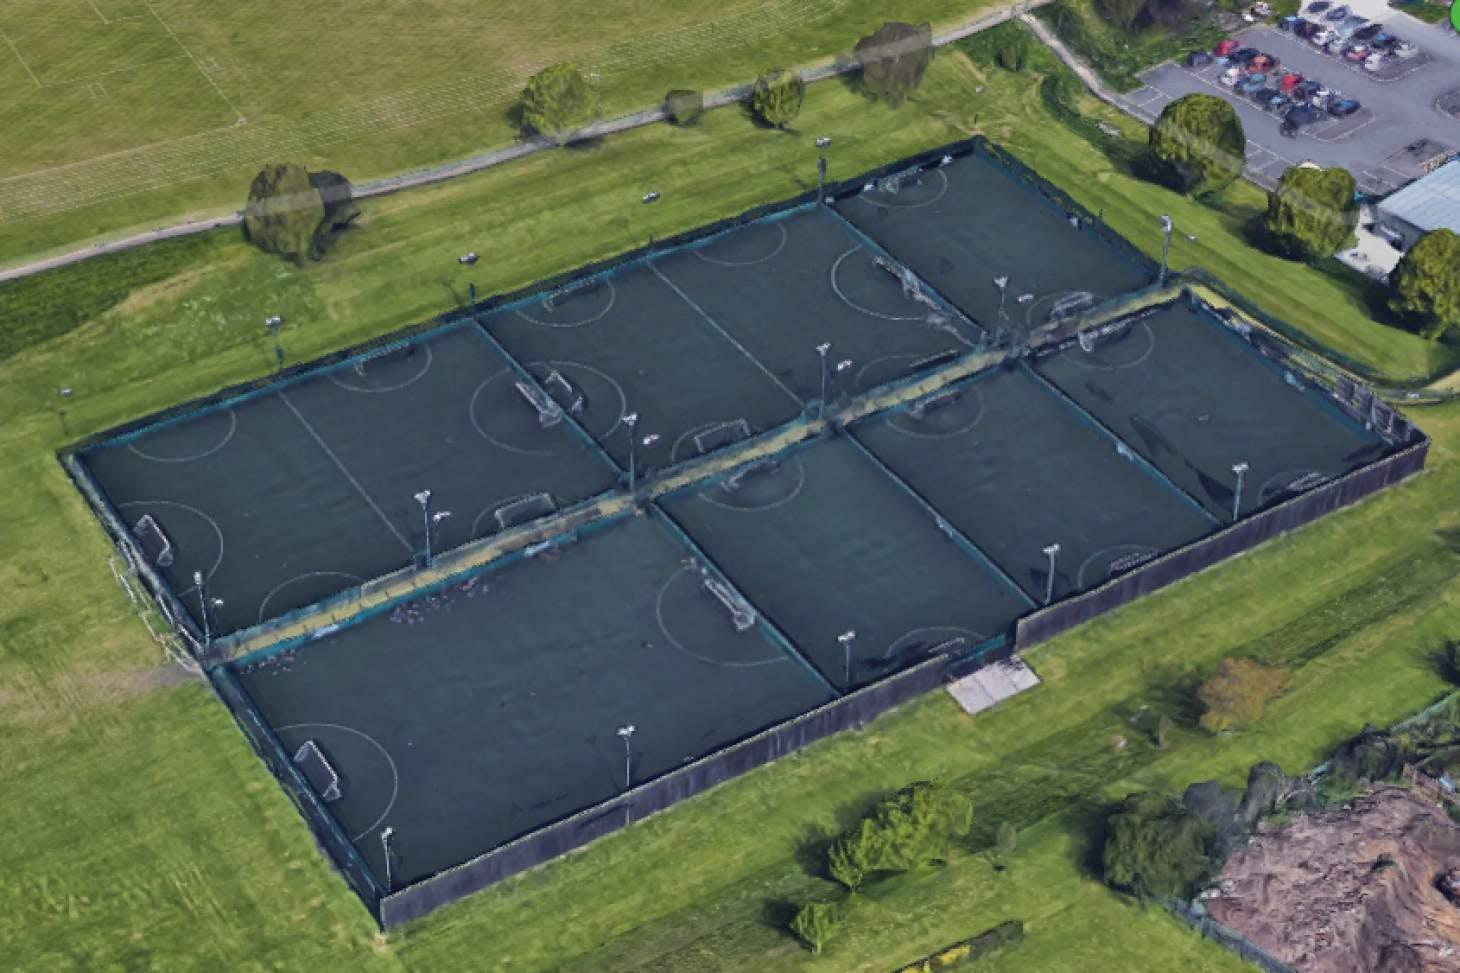 PlayFootball Gillingham 5 a side | 3G Astroturf football pitch